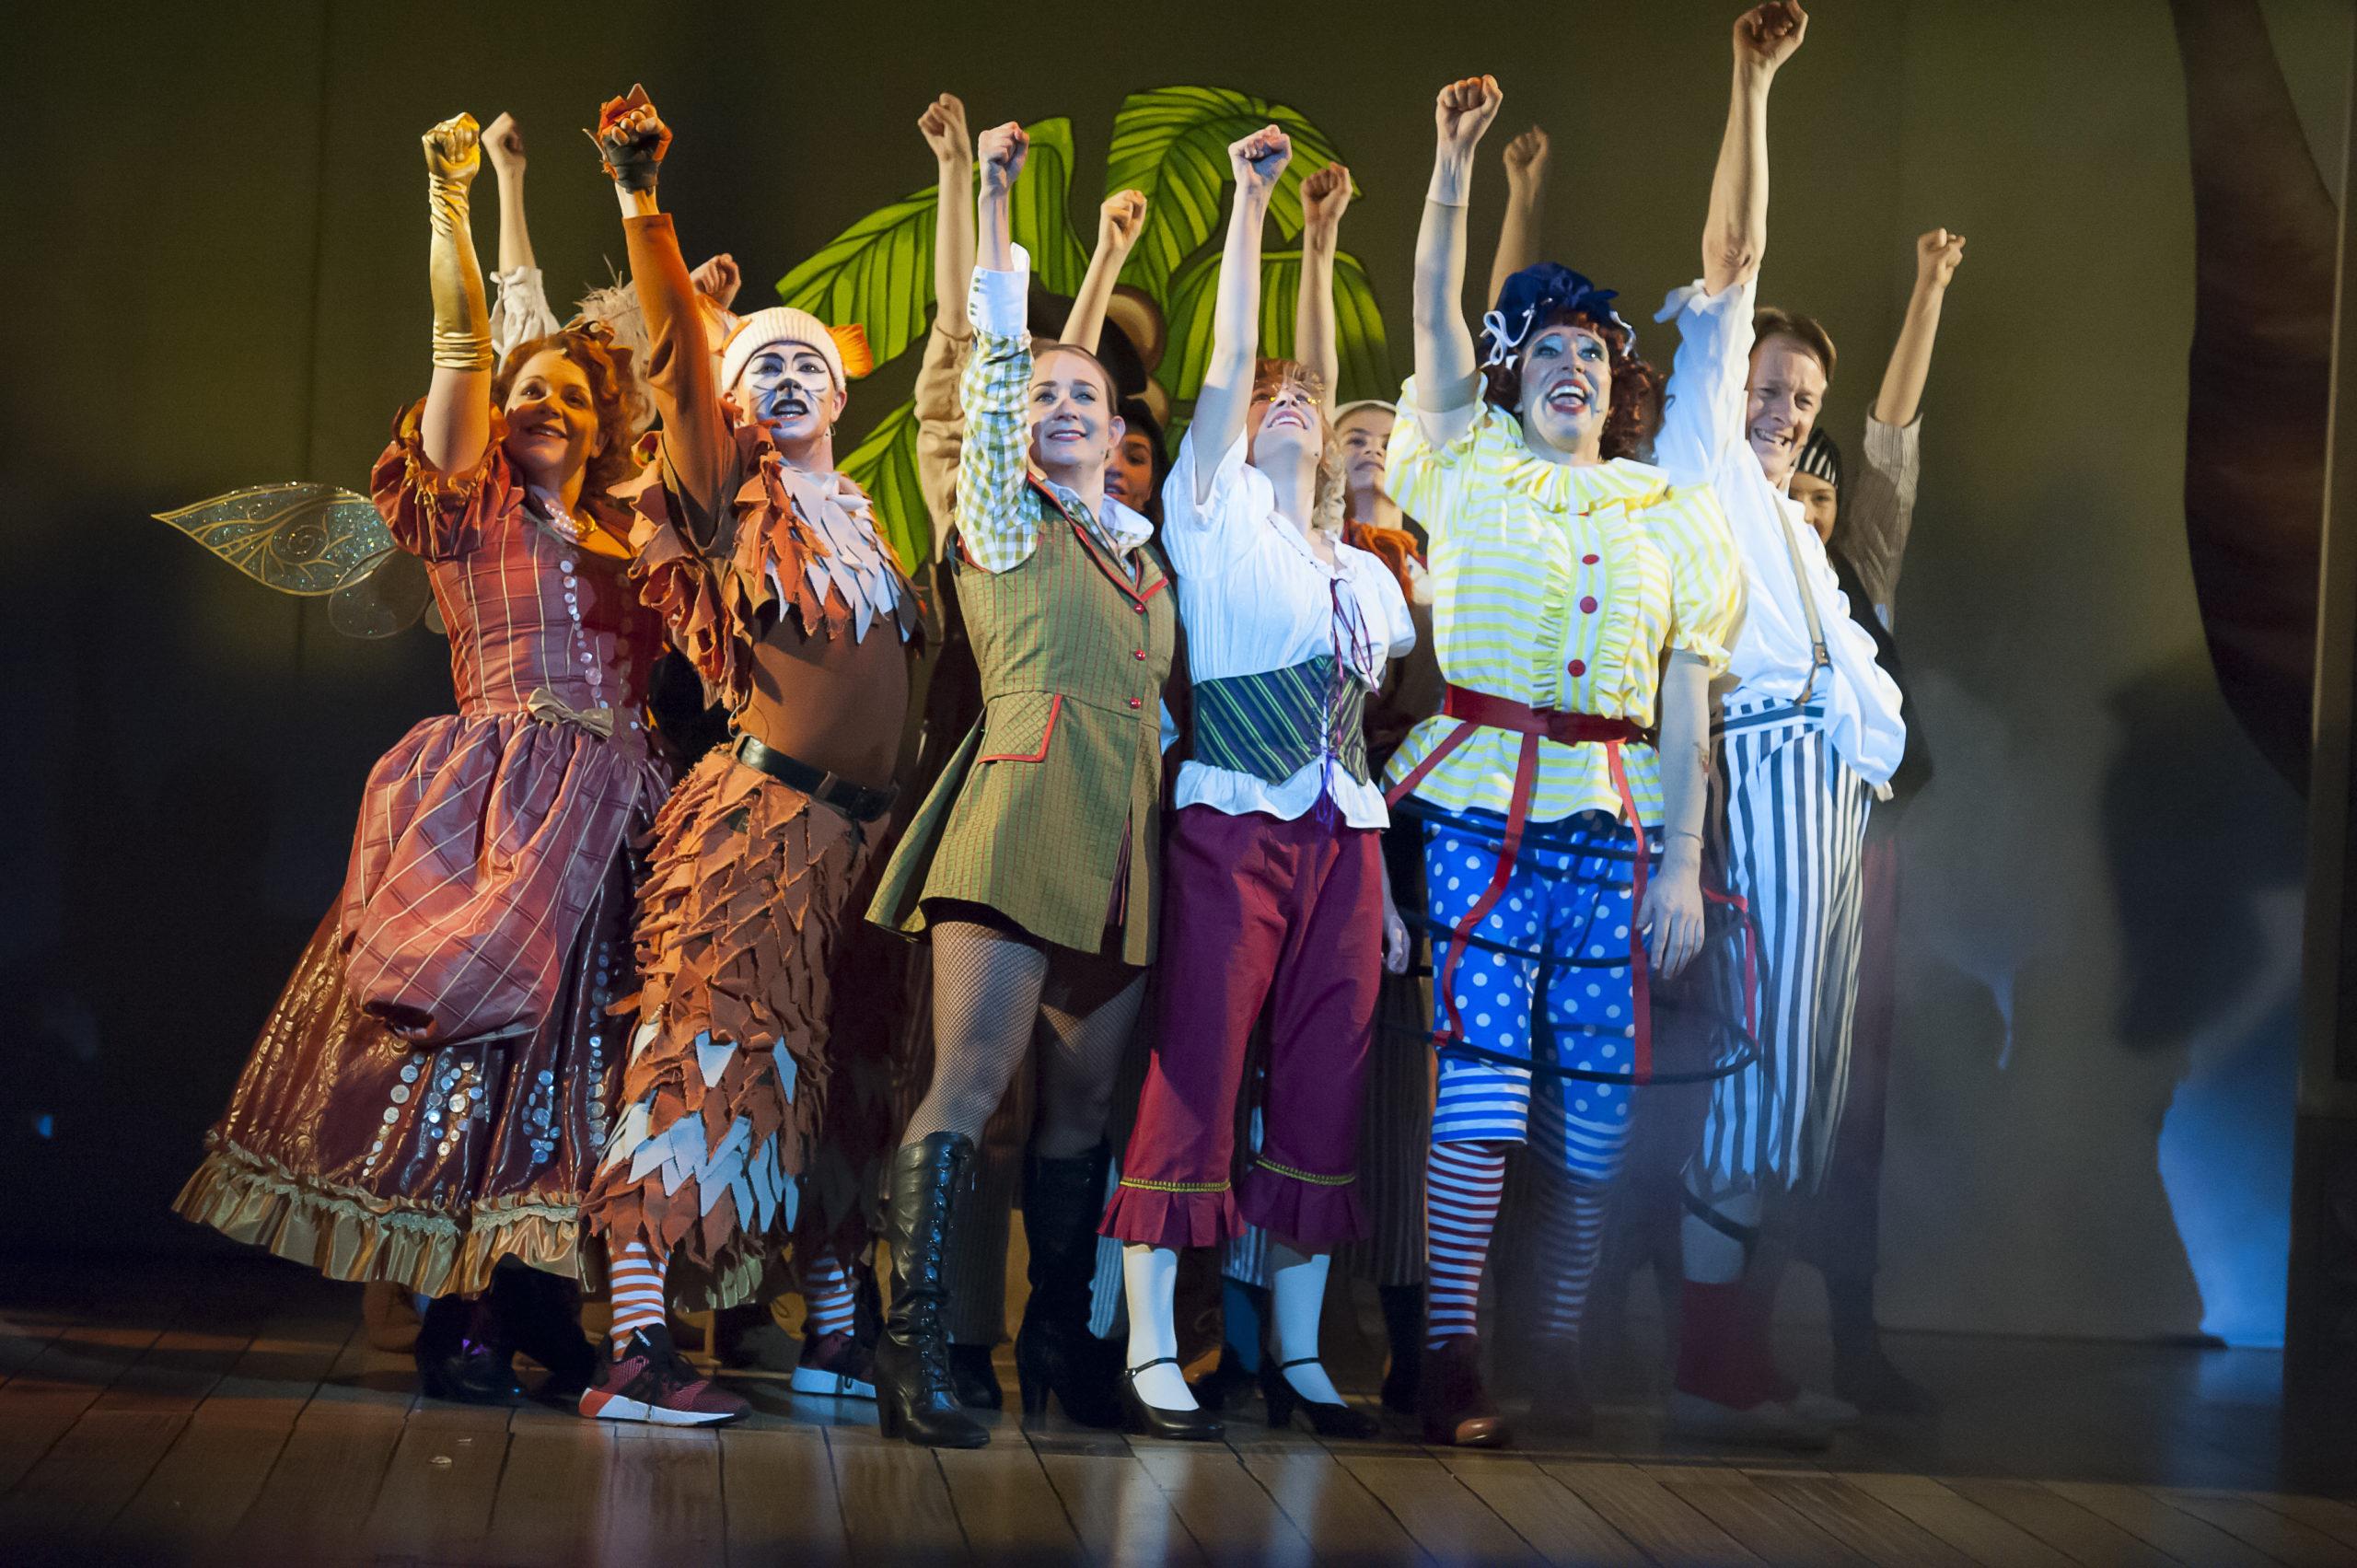 Dick Whittington full cast victory scene, 2017 pantomime